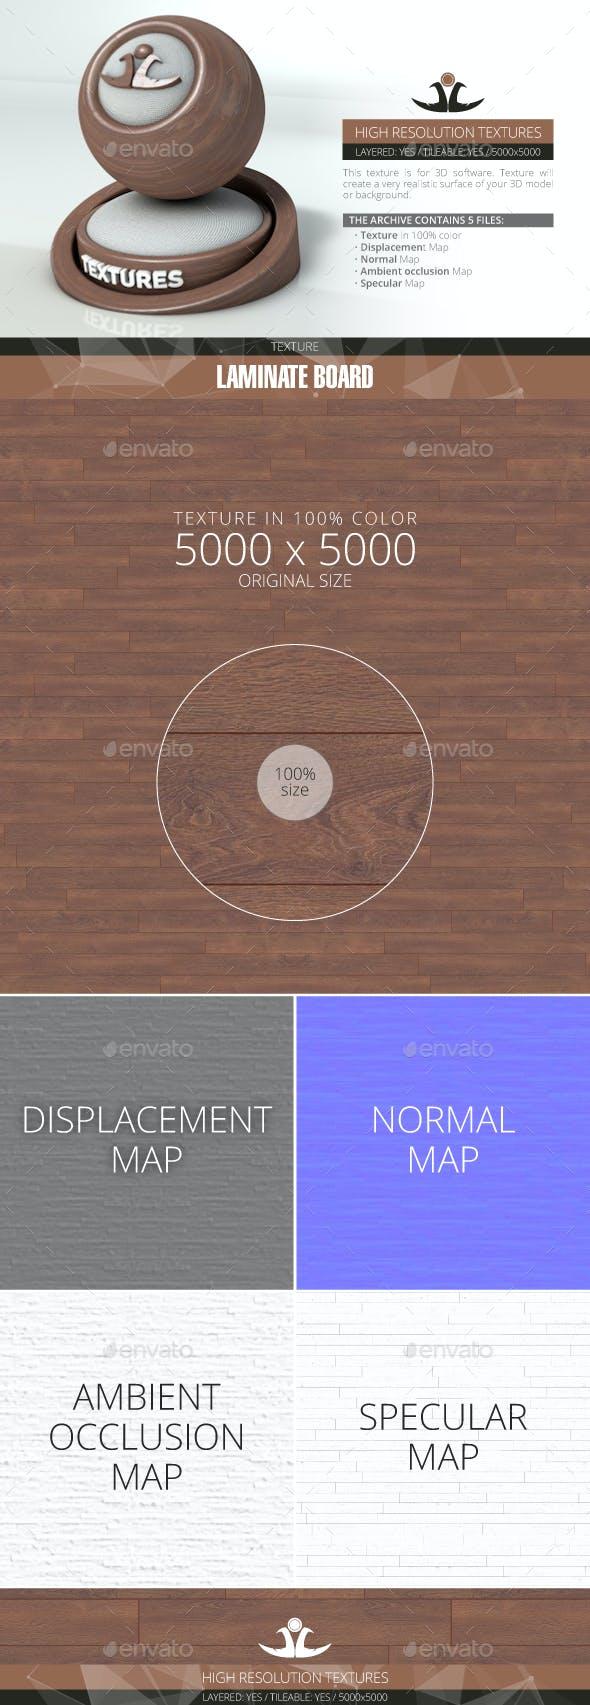 Laminate Board 58 - 3DOcean Item for Sale